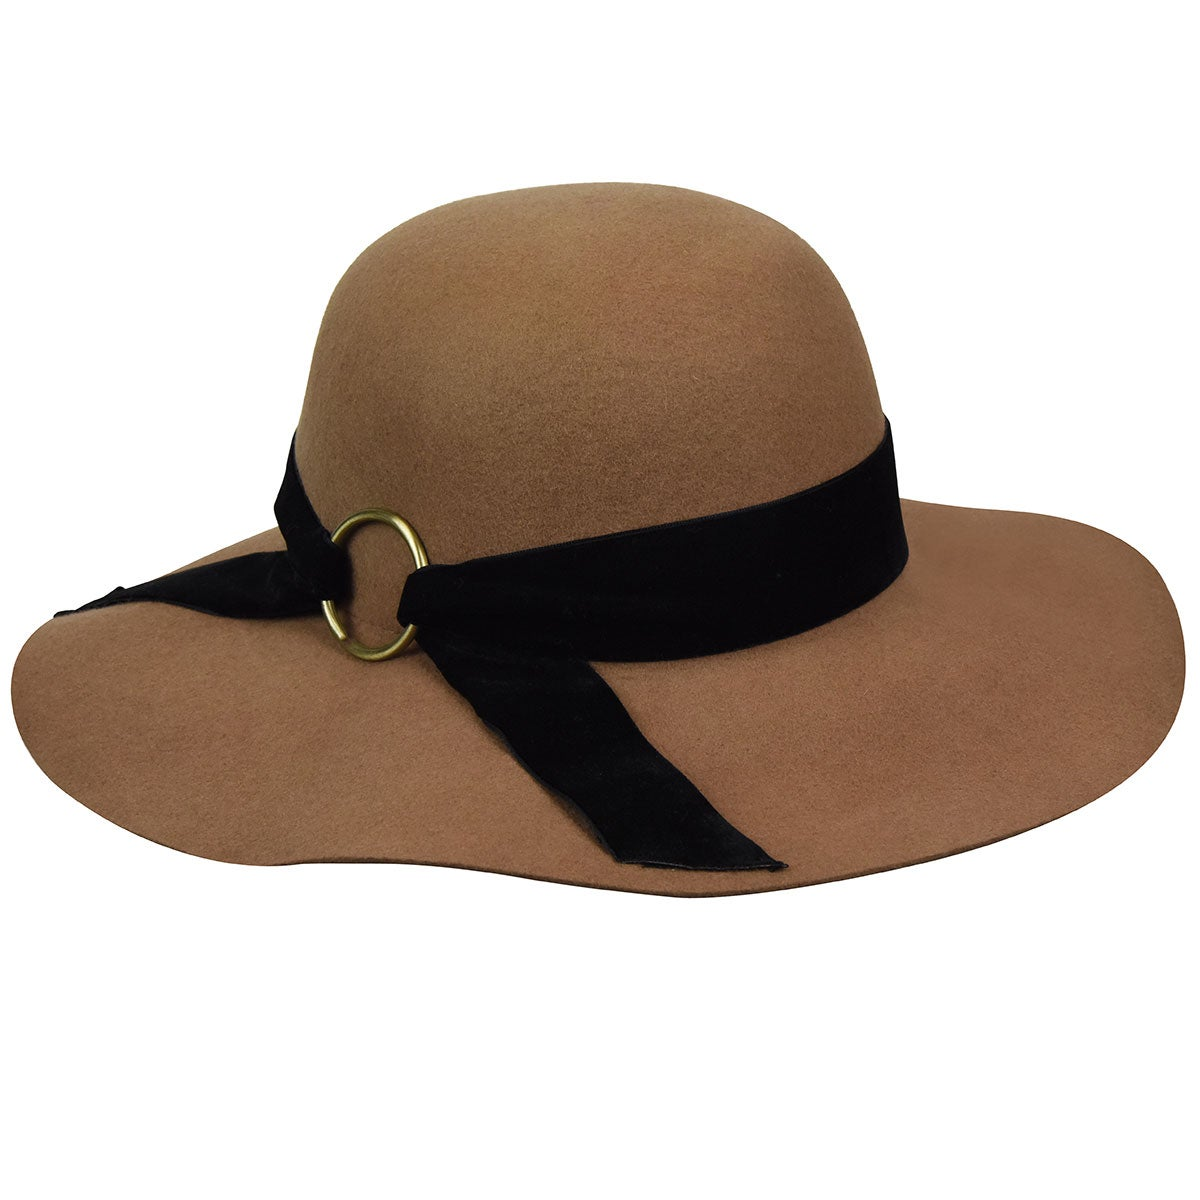 Women's Vintage Hats | Old Fashioned Hats | Retro Hats Wharton Wide Brim Floppy Hat $64.00 AT vintagedancer.com